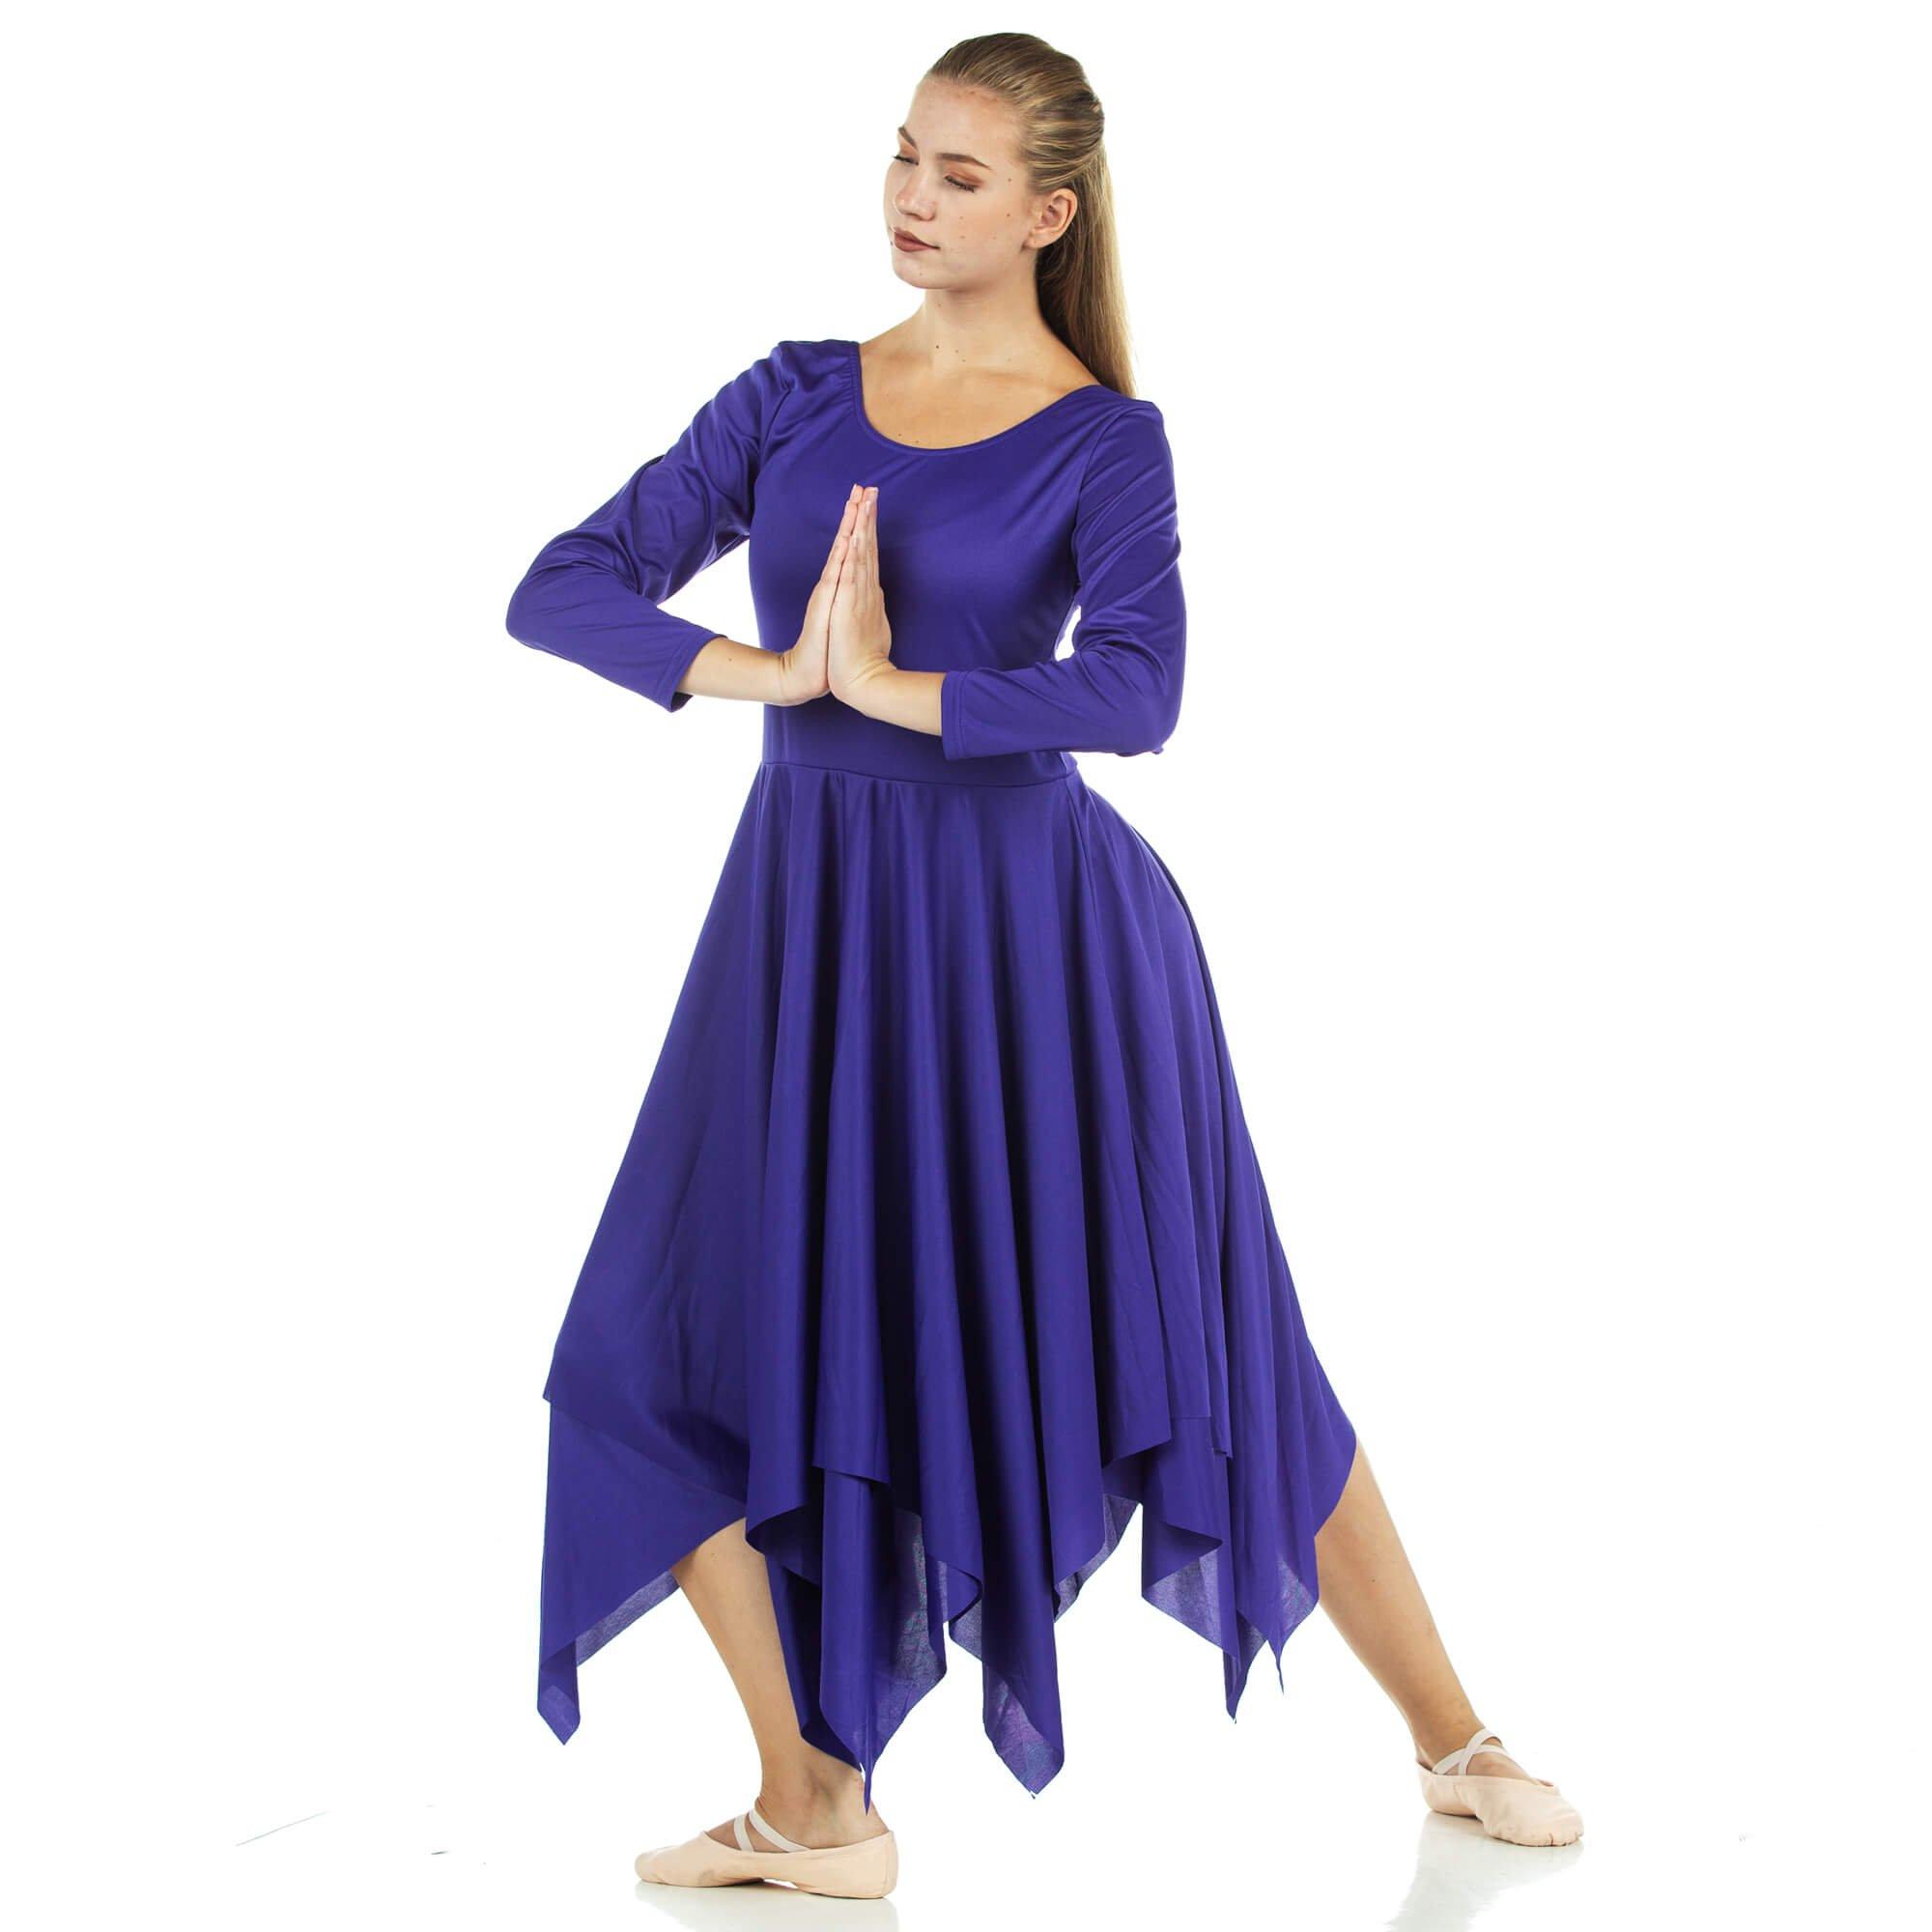 Danzcue Womens Celebration of Spirit Long Sleeve Dance Dress, Deep Purple, 2XL-3XL by Danzcue